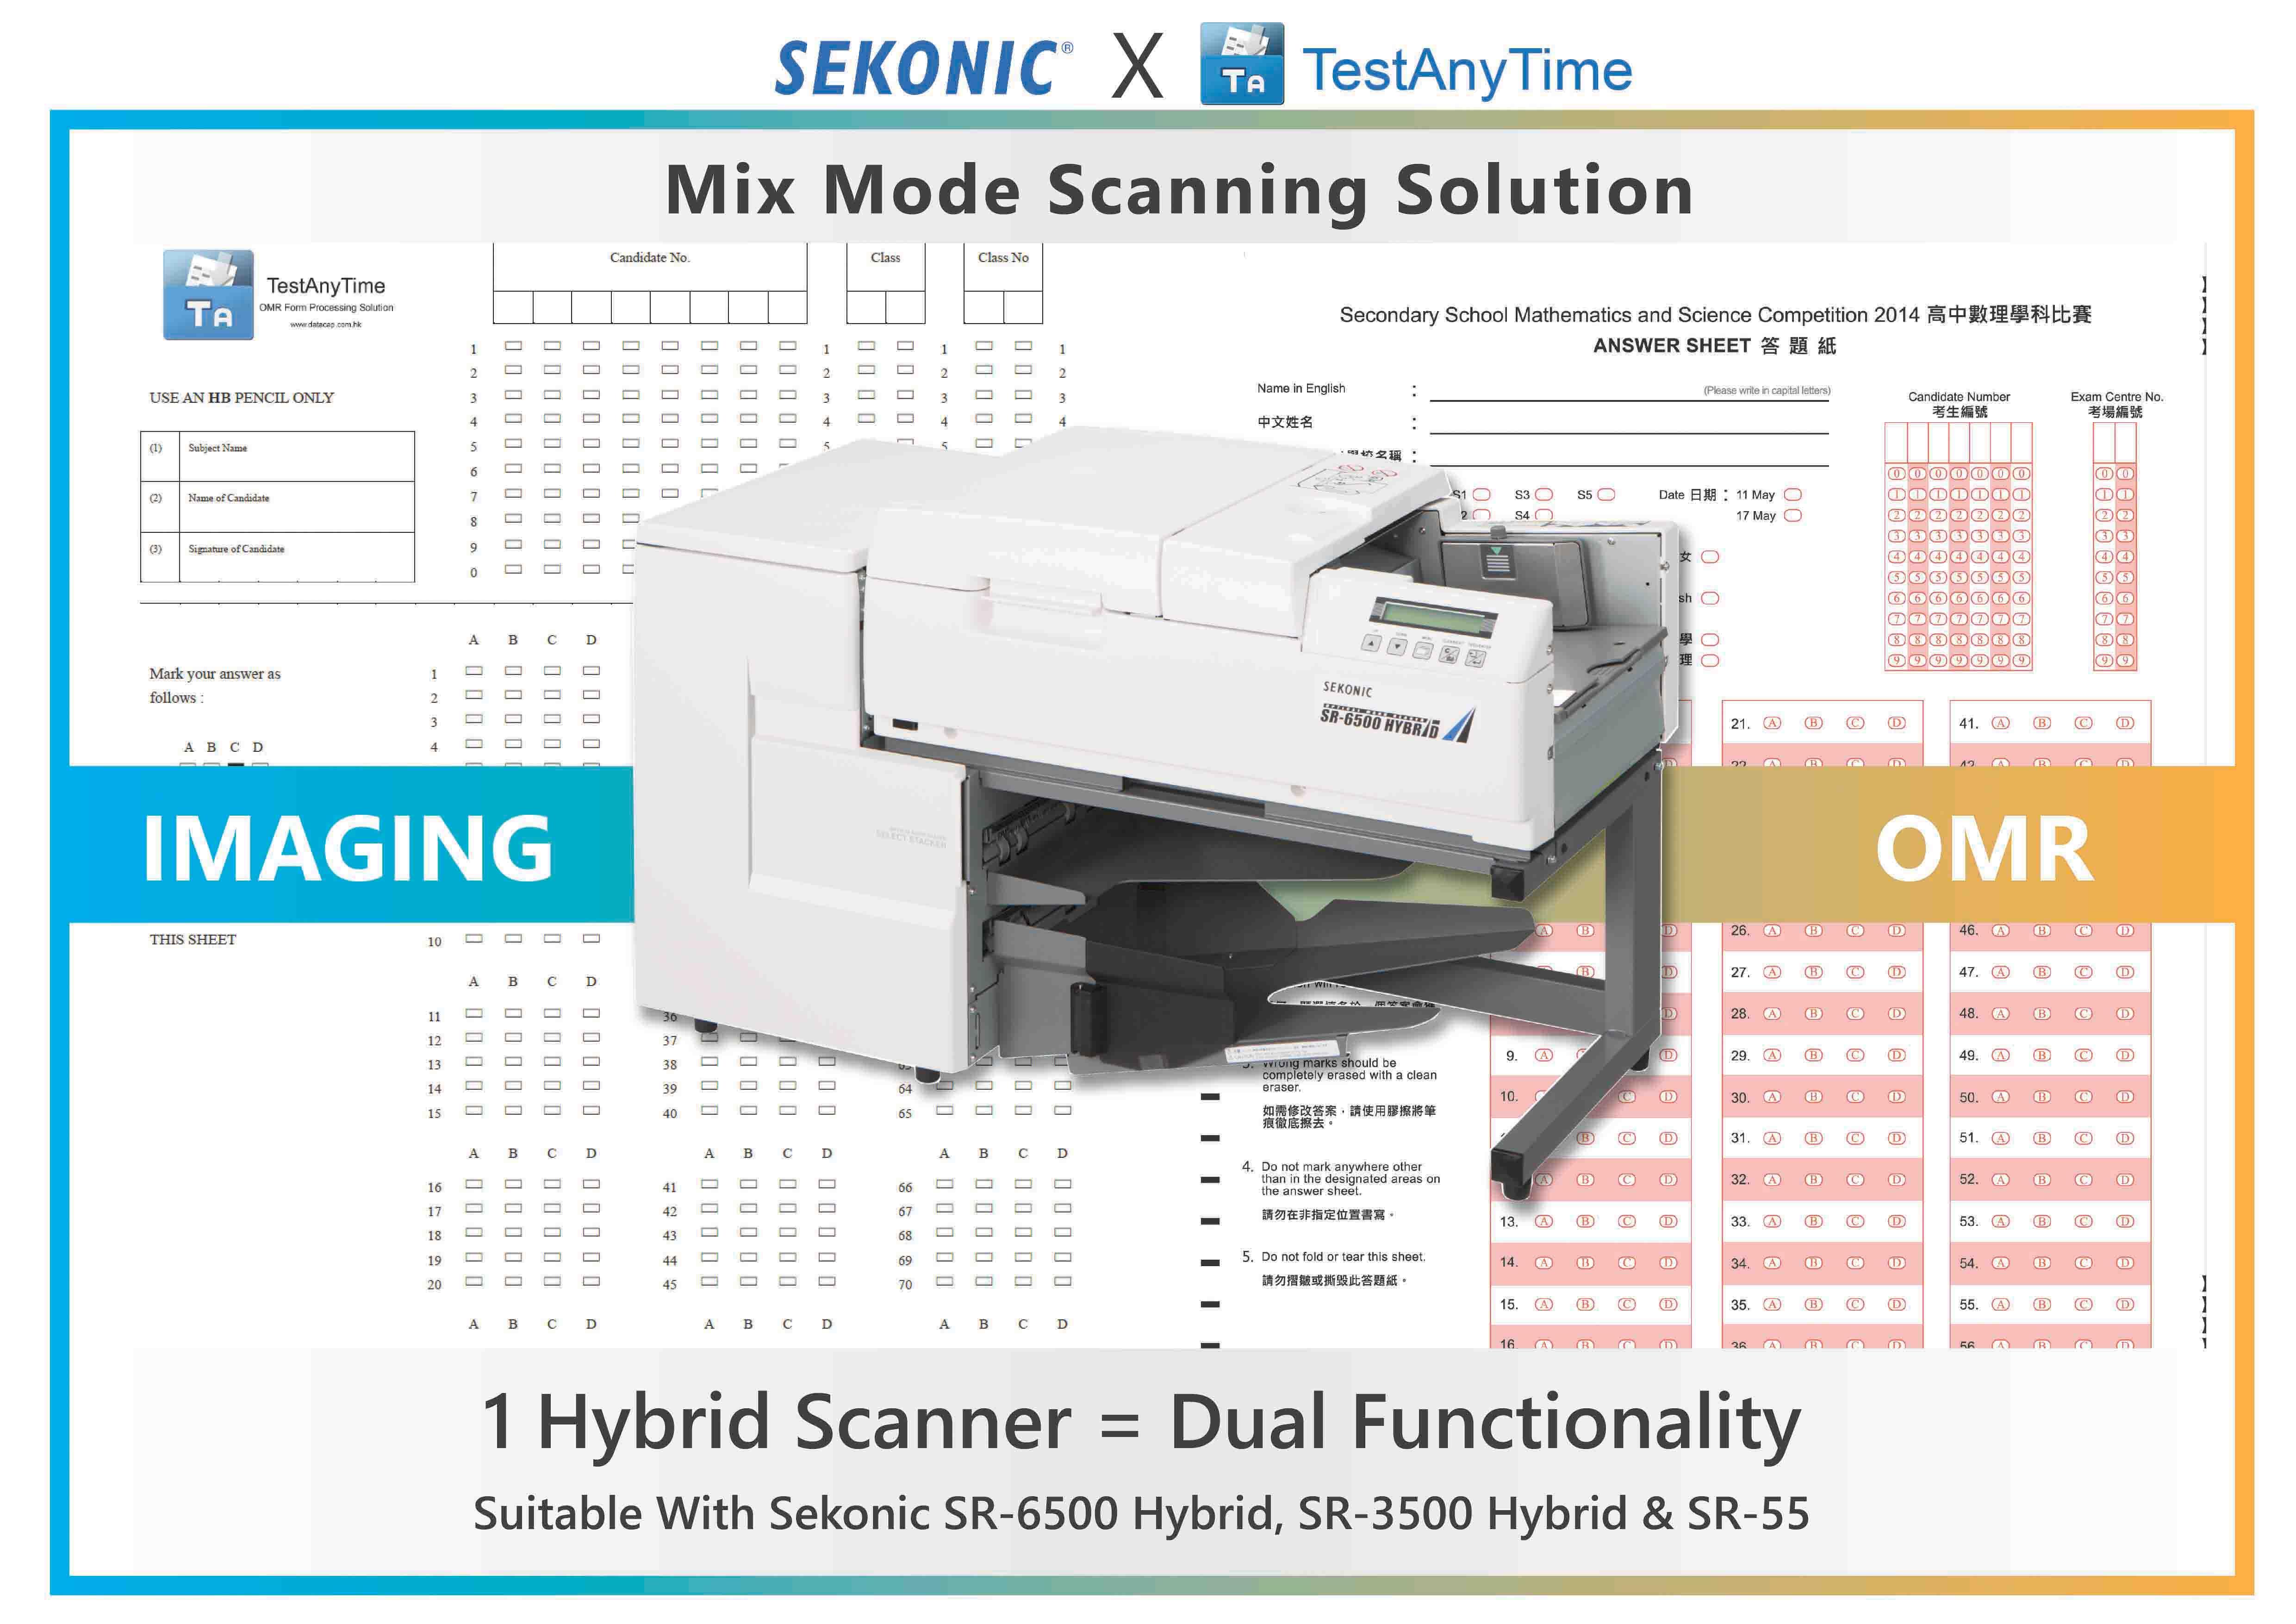 TestAnyTime & Sekonic: Mix Mode Scan (Imaging & OMR